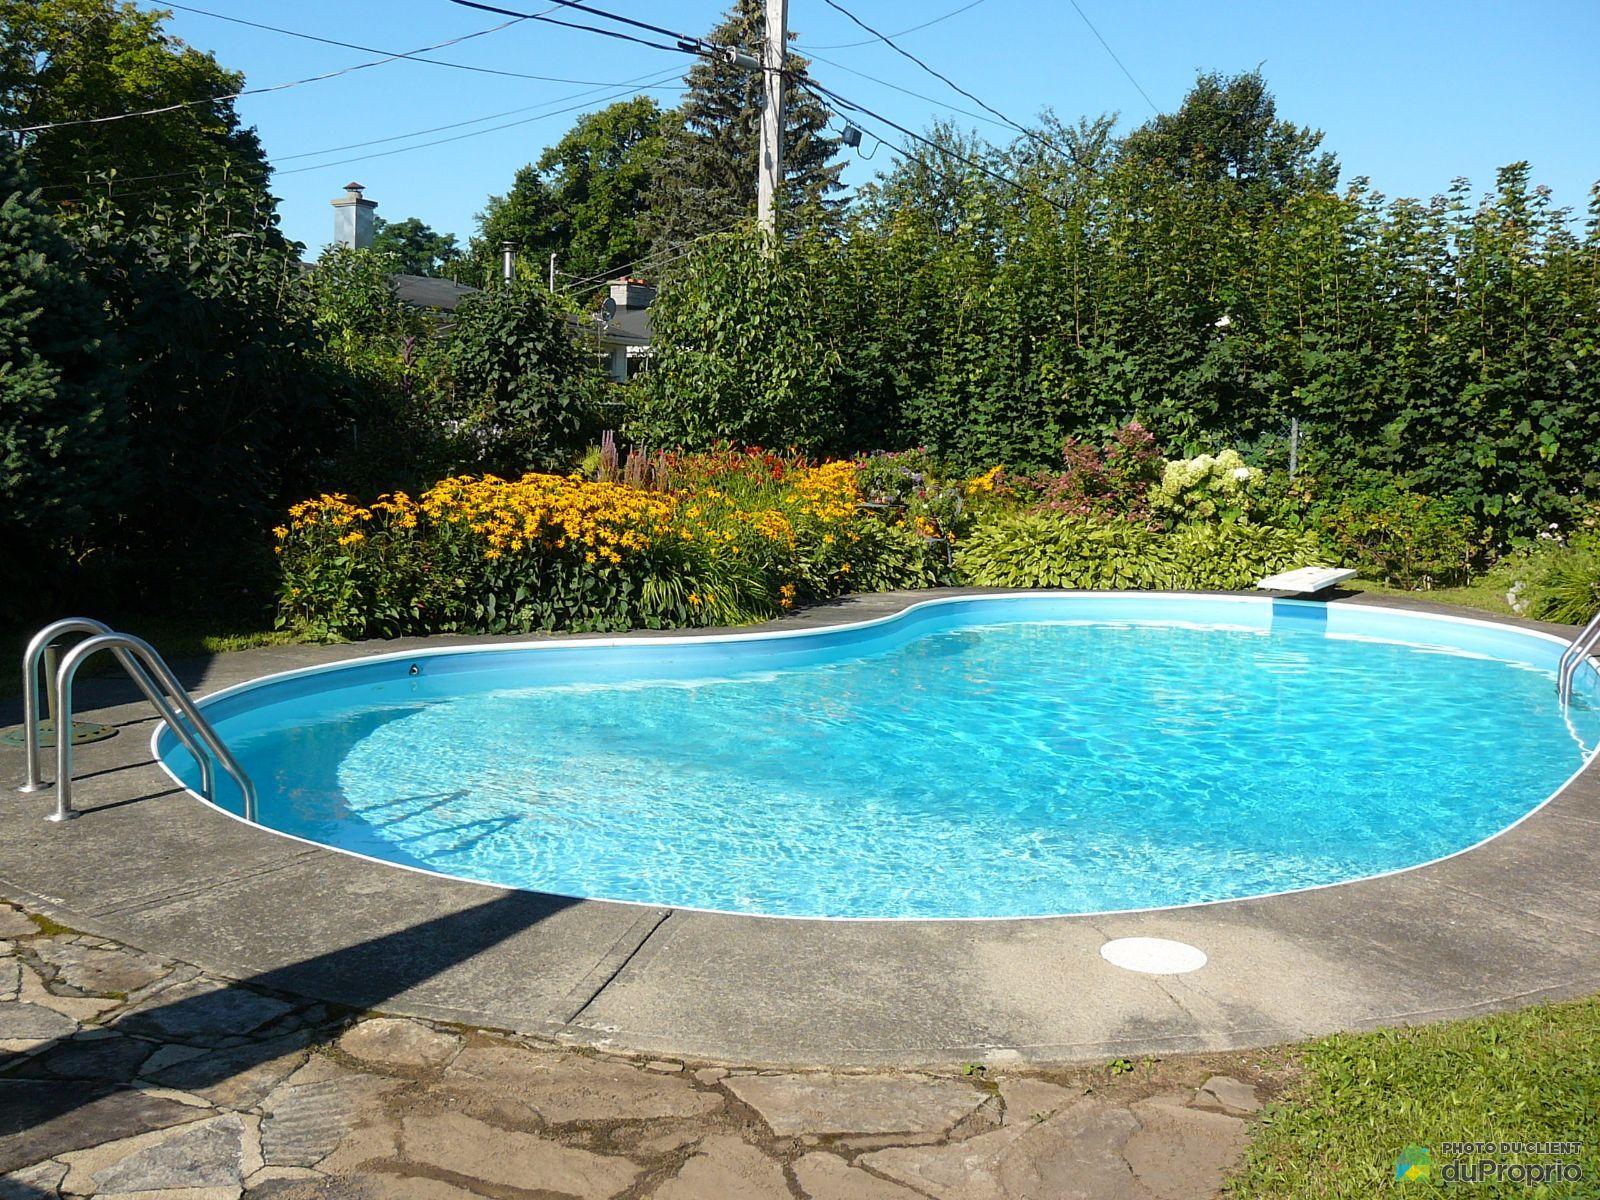 Maison vendre charlesbourg 6865 5e avenue est for Arpidrome charlesbourg piscine